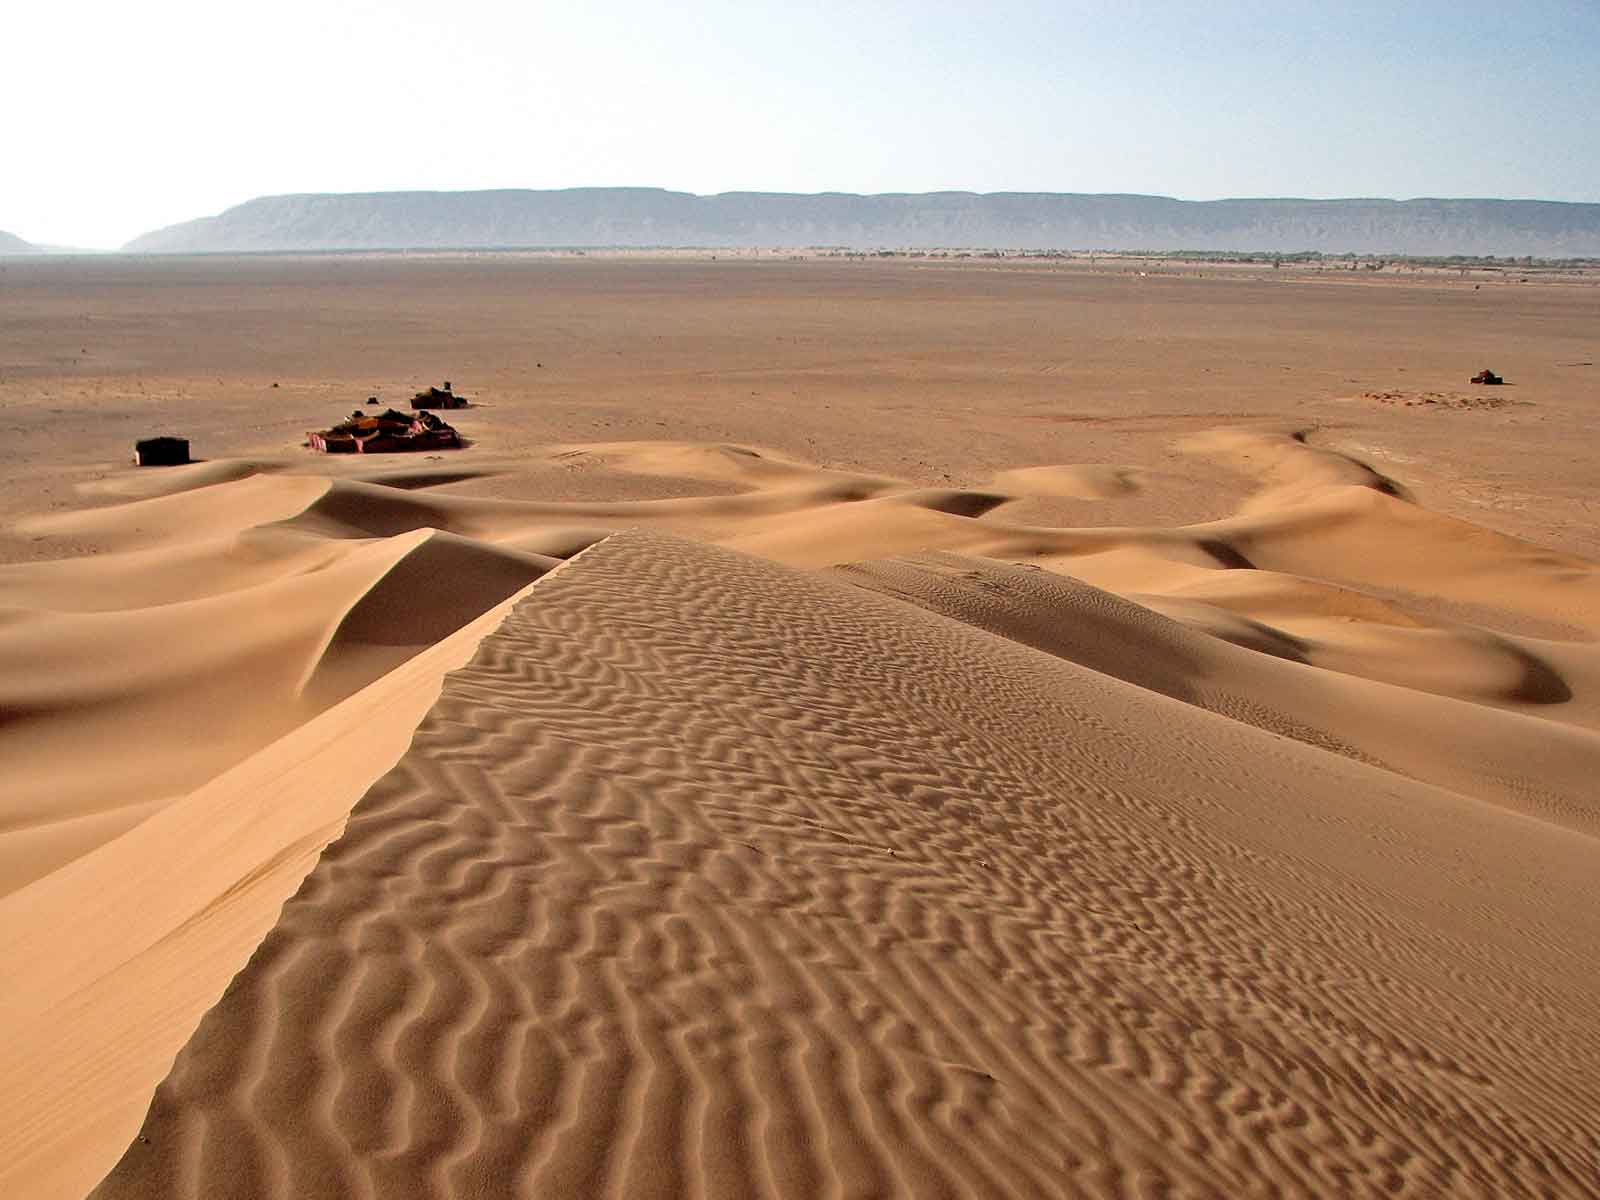 Sahara desert tour from Marrakech to zagora 2 days